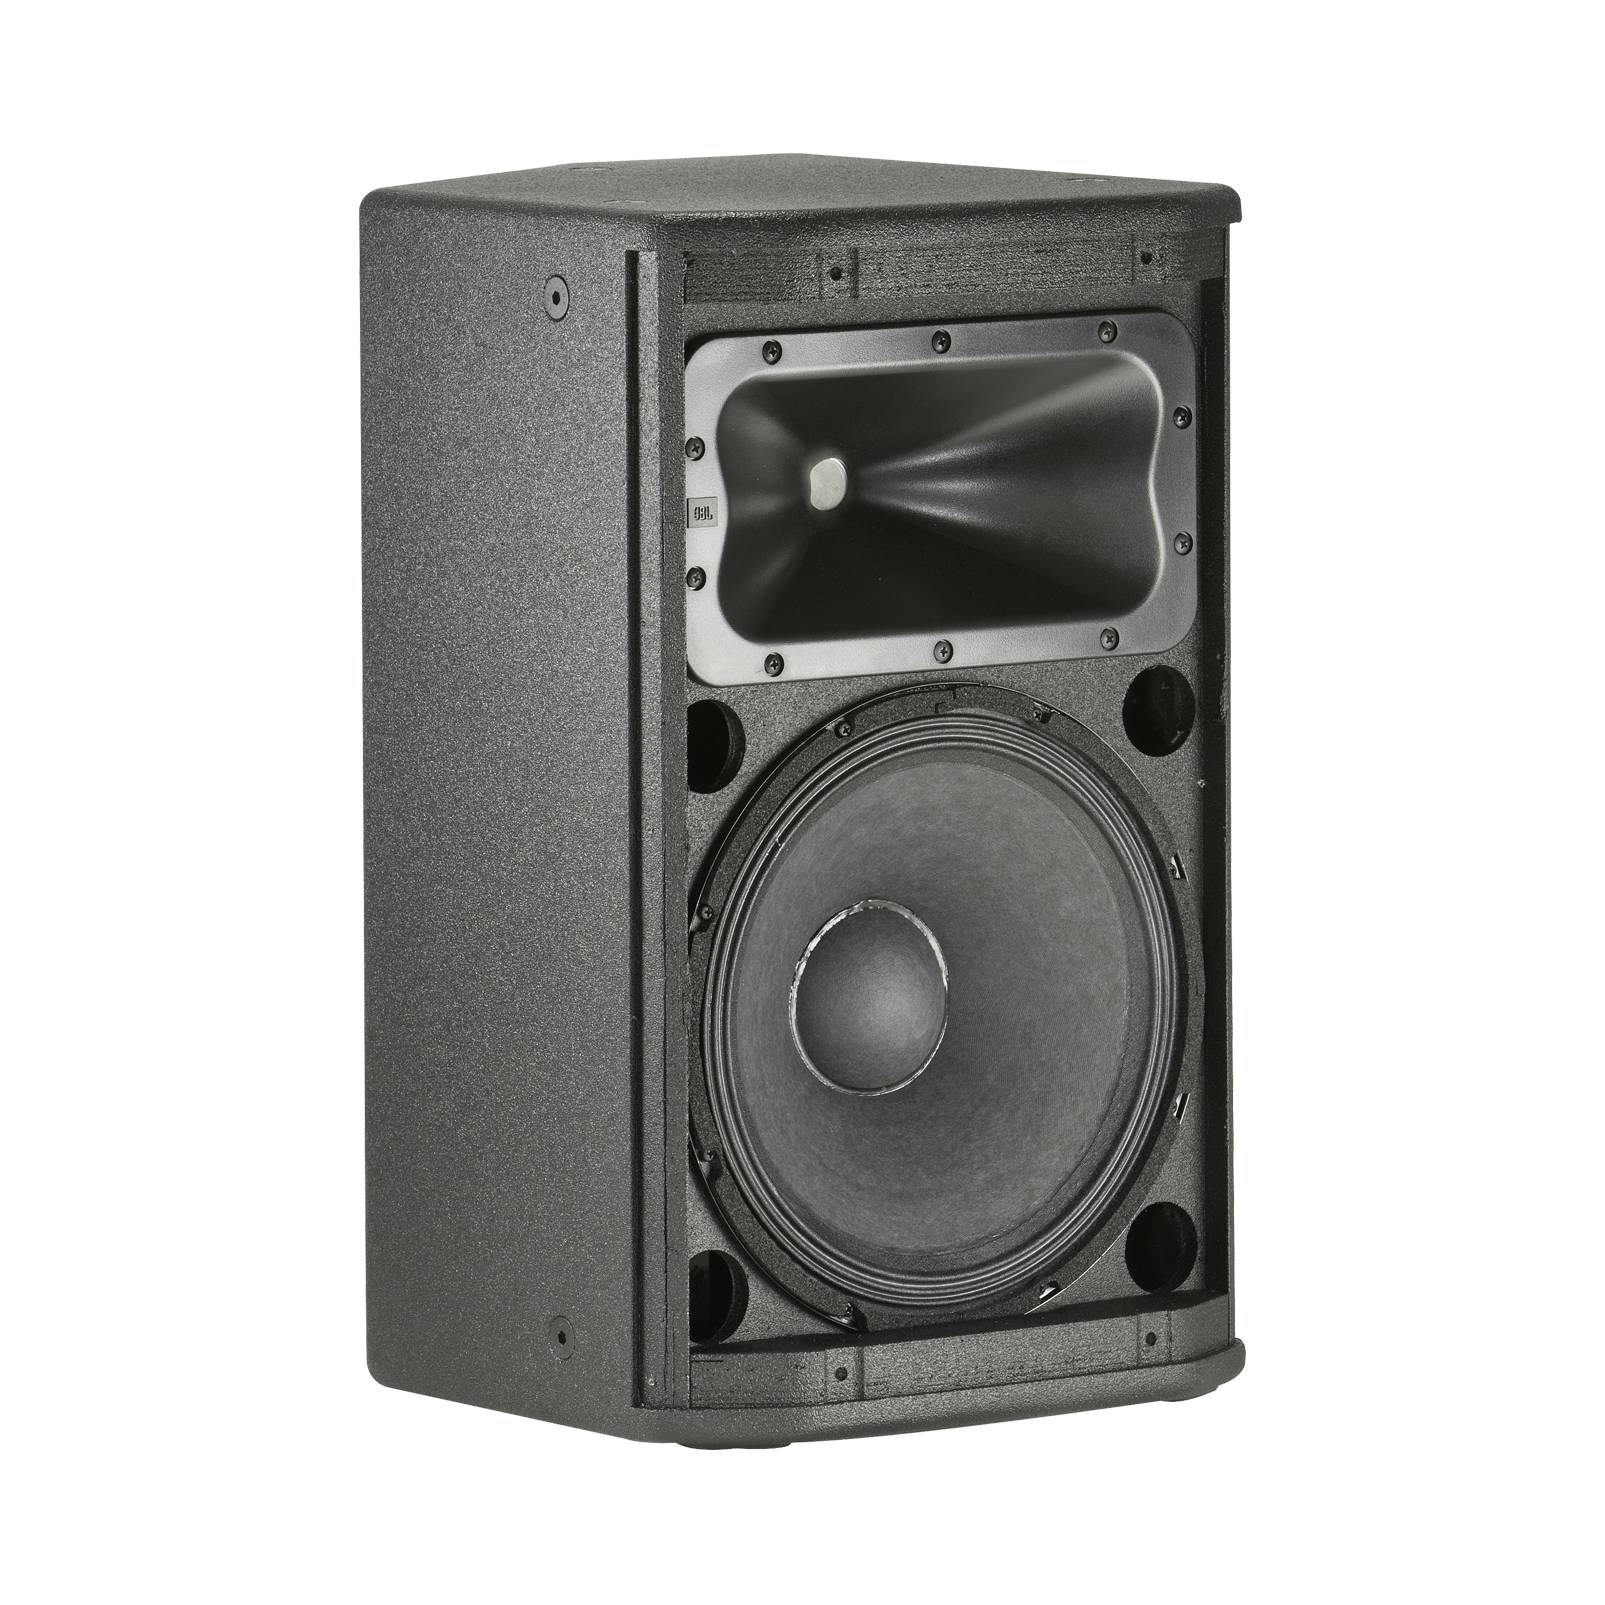 "JBL PRX412M - Black - 12"" Two-Way Stage Monitor and Loudspeaker System - Detailshot 1"